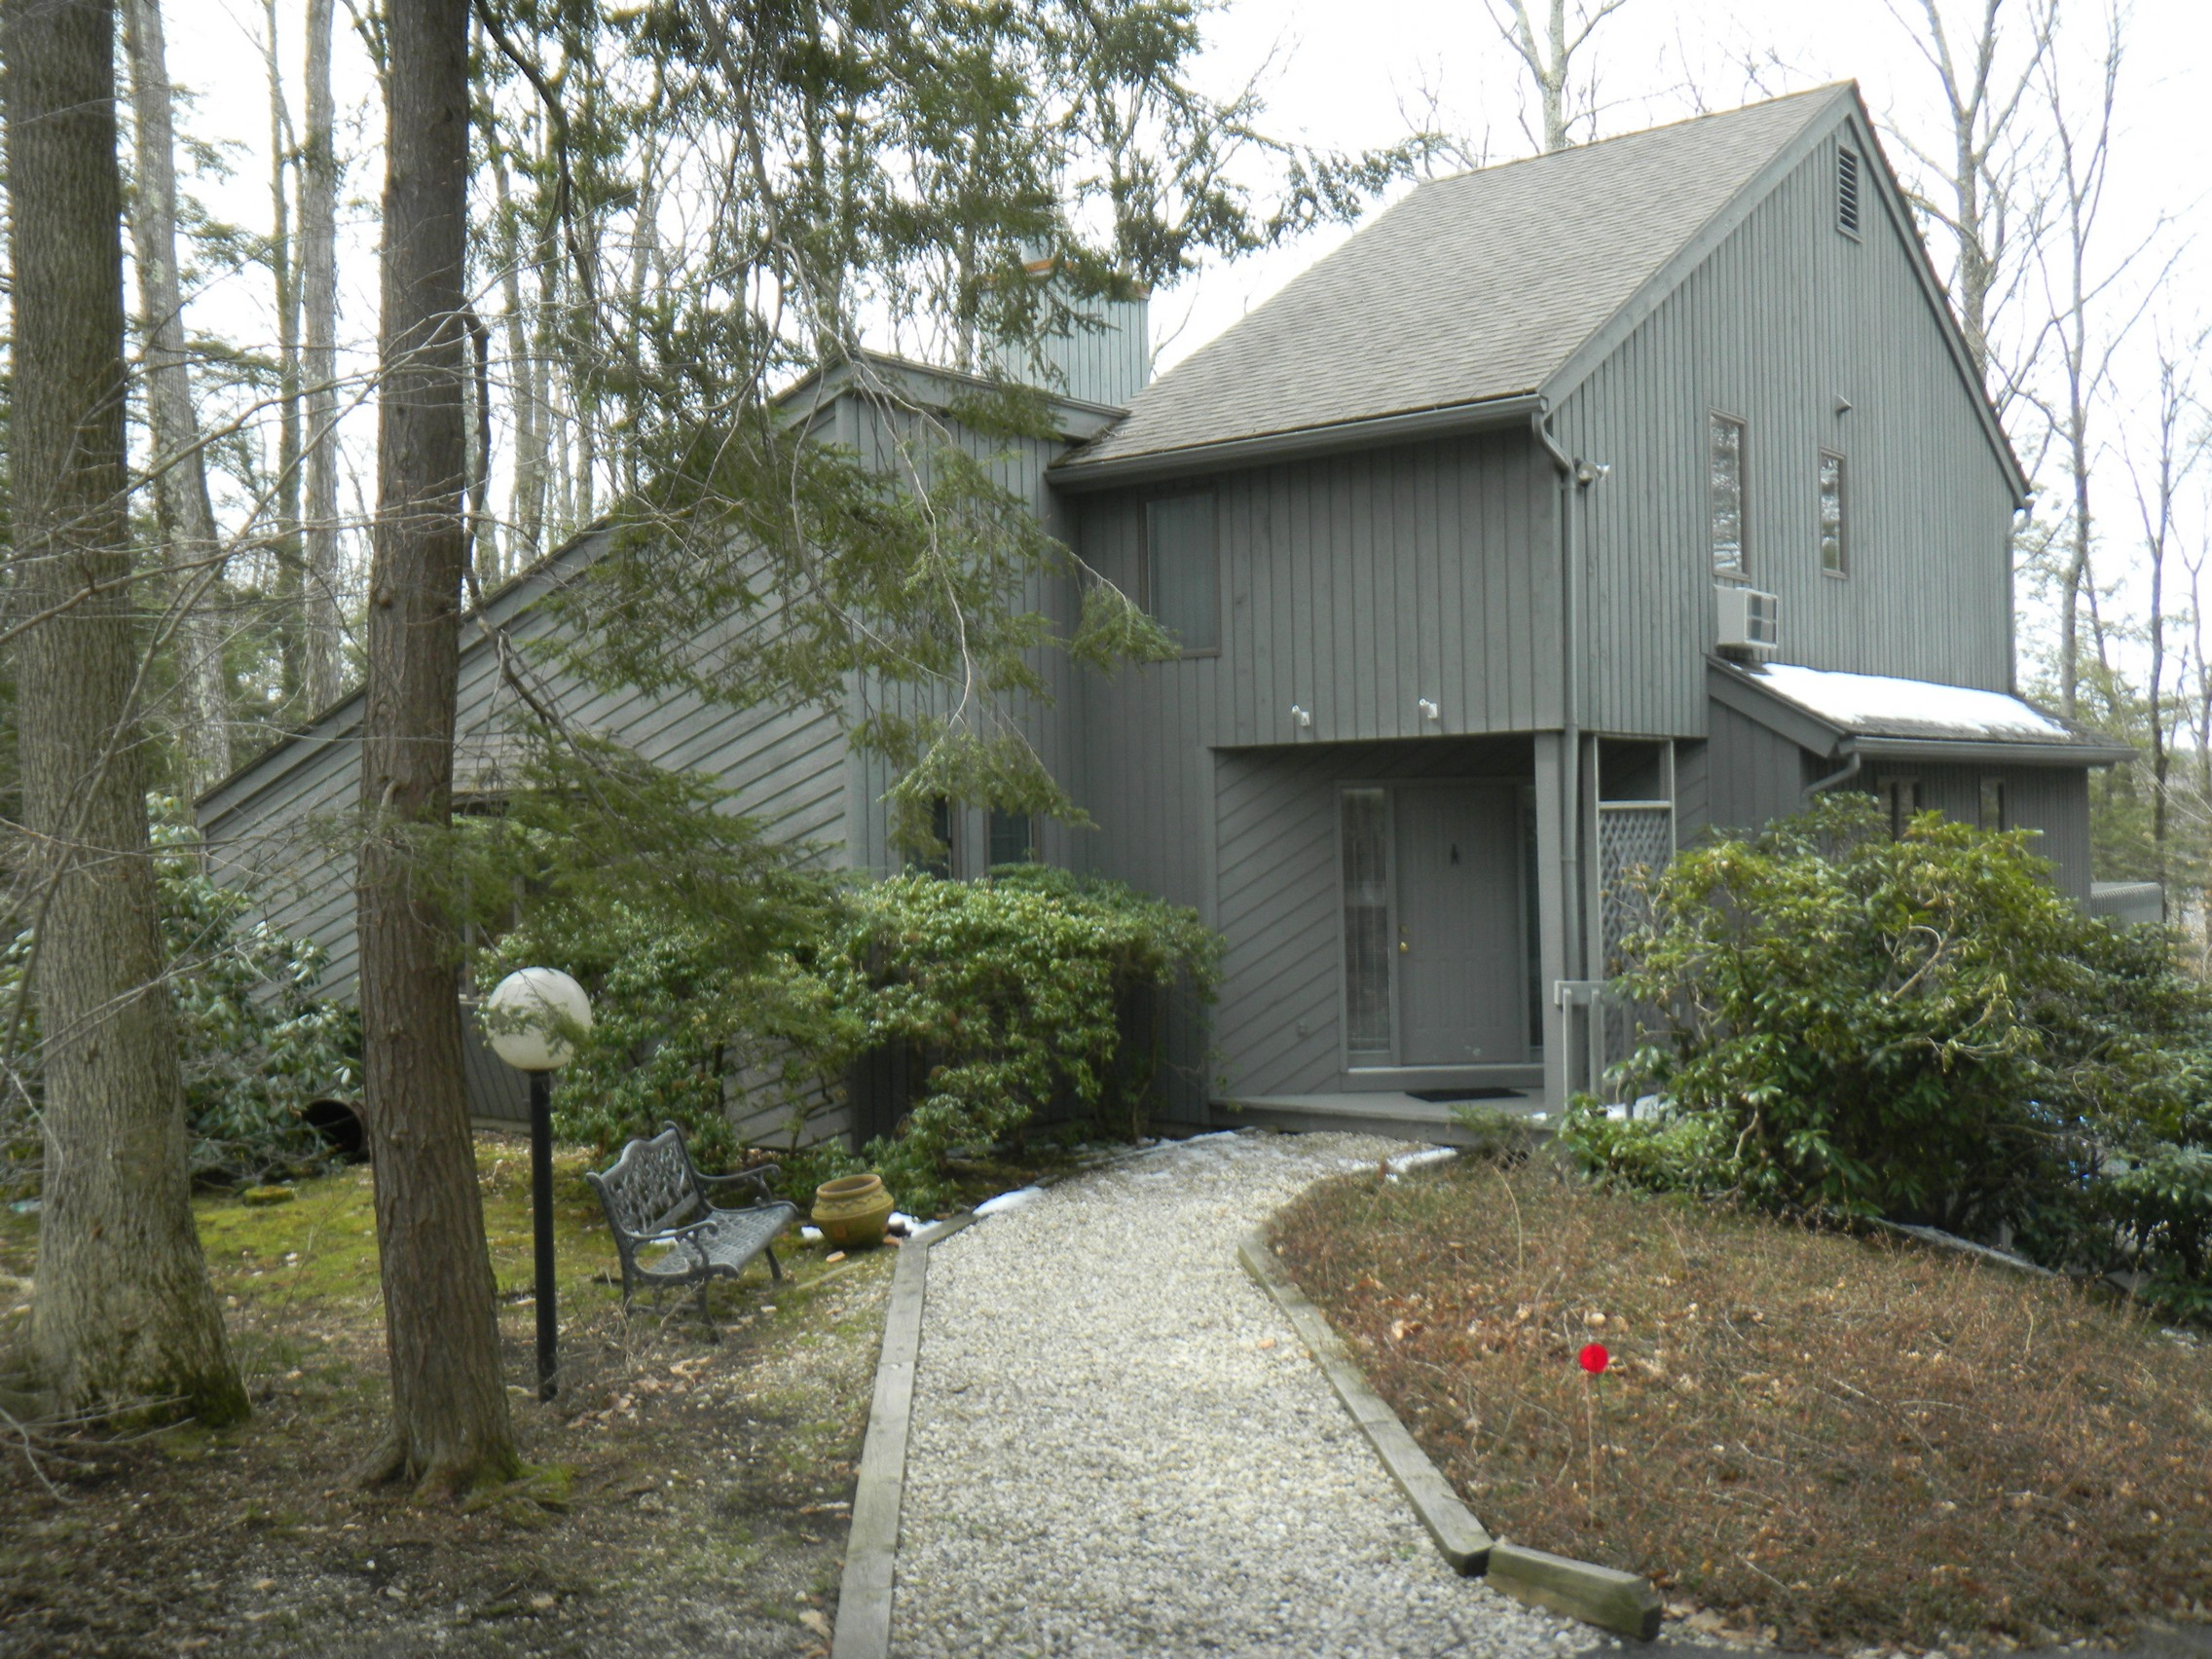 Single Family Home for Sale at Woodridge Lake Home 136 Wellsford Drive Goshen, Connecticut, 06756 United States